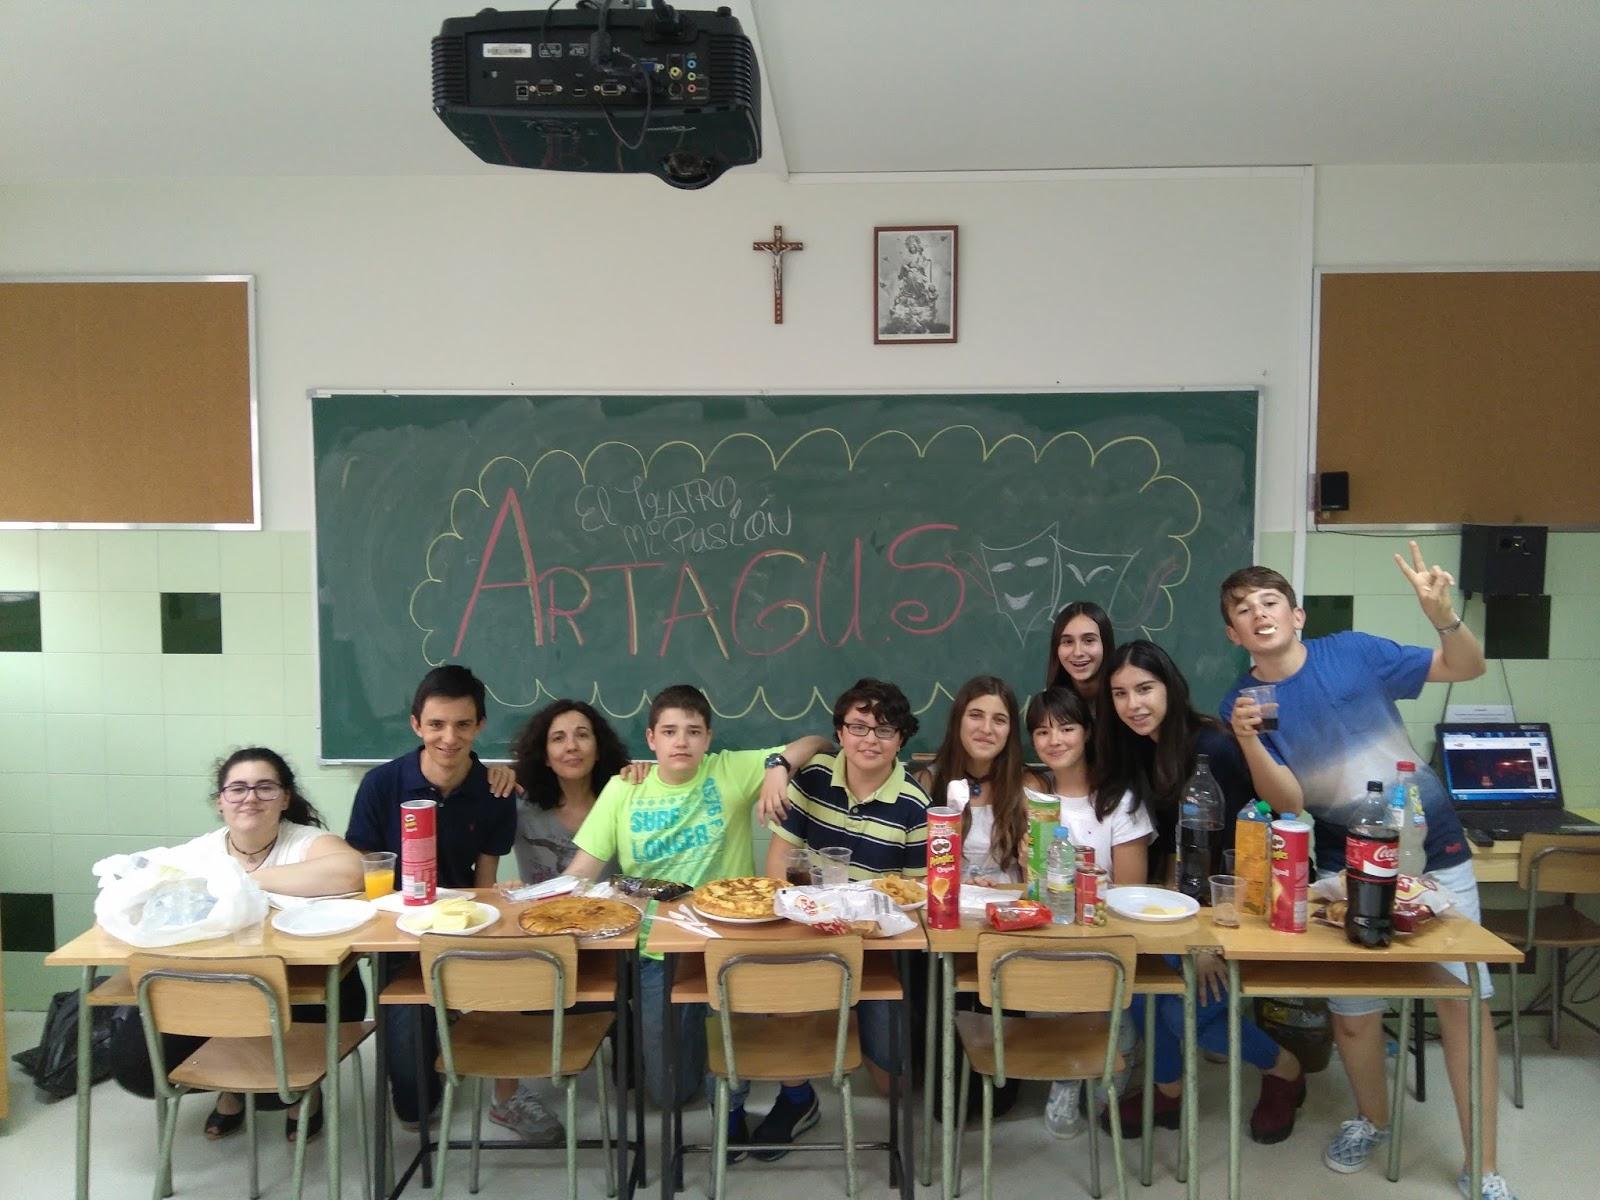 Agustinas Valladolid - 2017 - Artagus - Fiesta